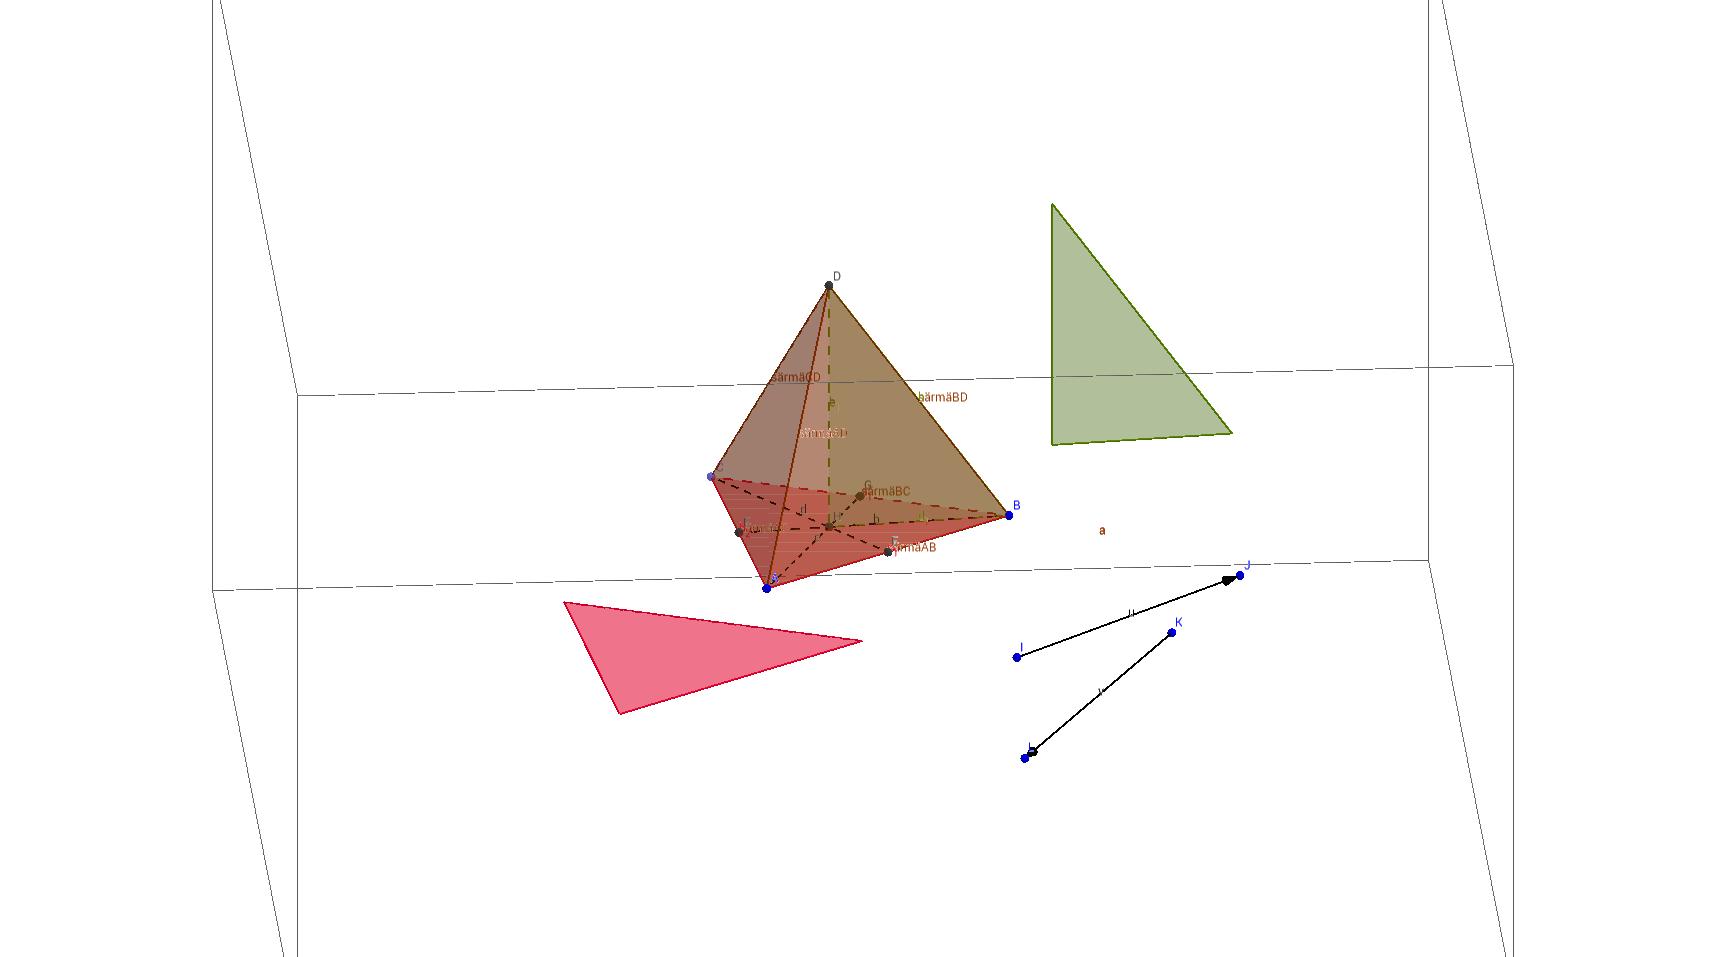 Tetraedri